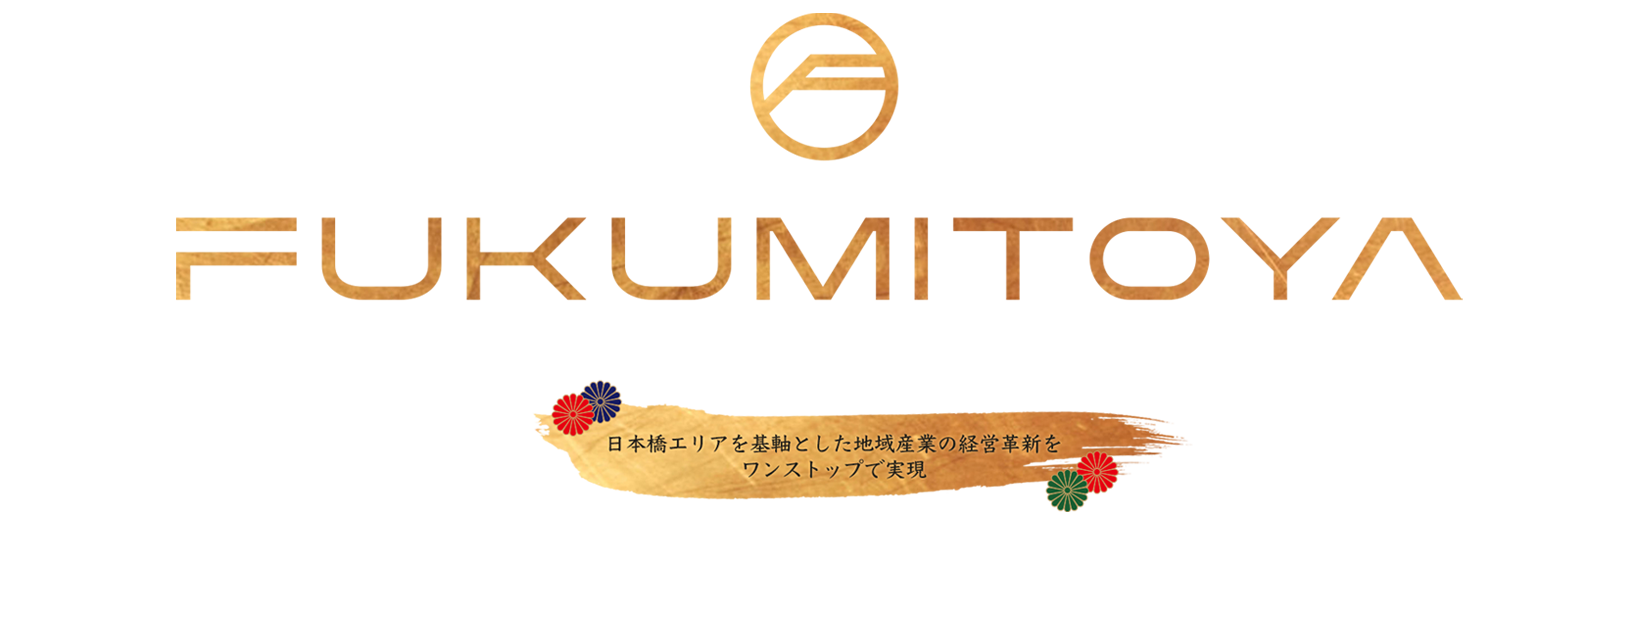 FUKUMITOYA